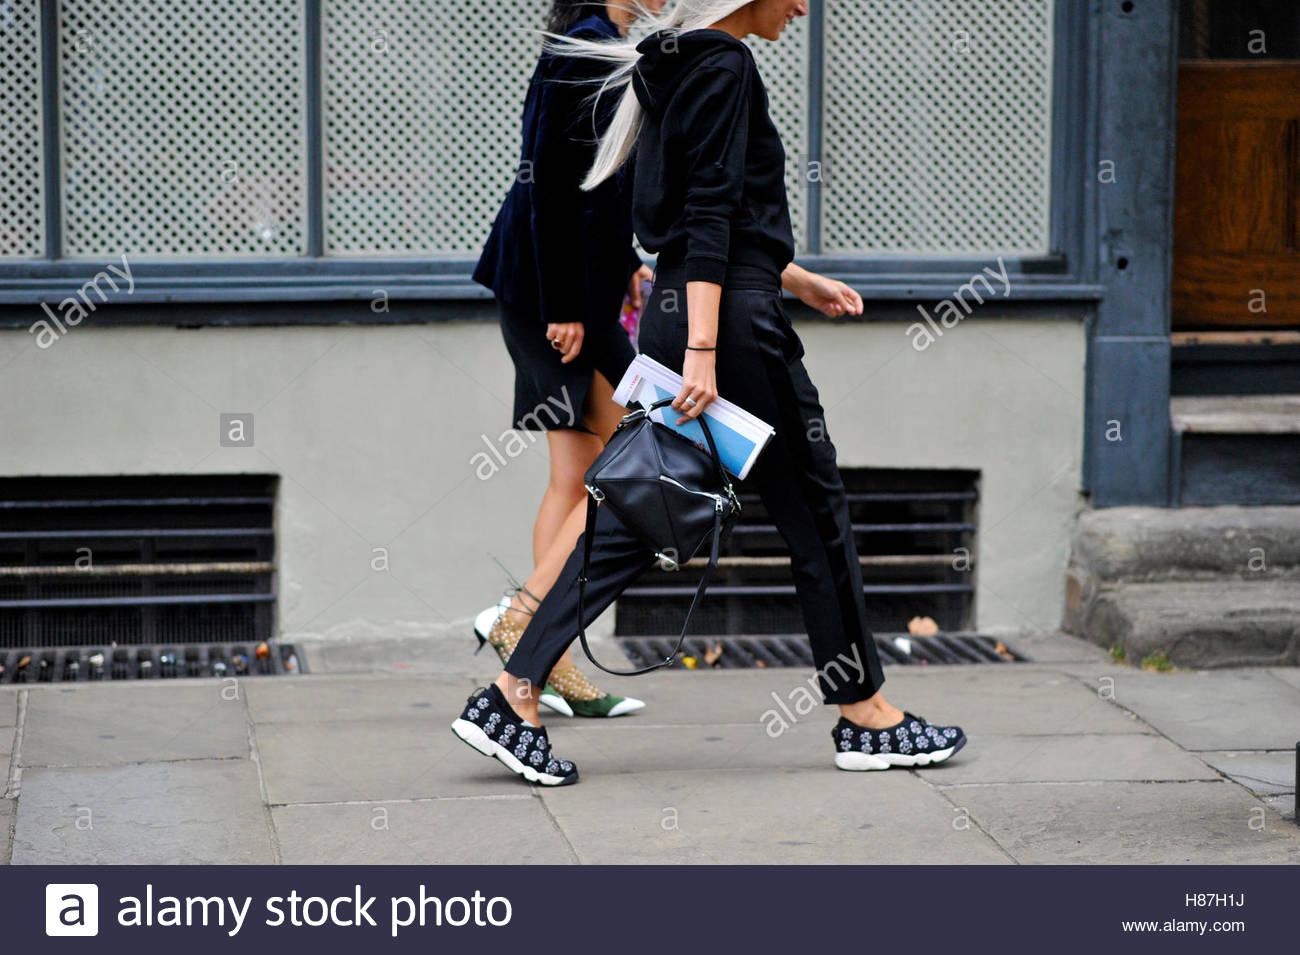 Sarah Harris, Old Spitalfields Market London Fashion Week SS17 FW16 Street Style September 17 2016. - Stock Image